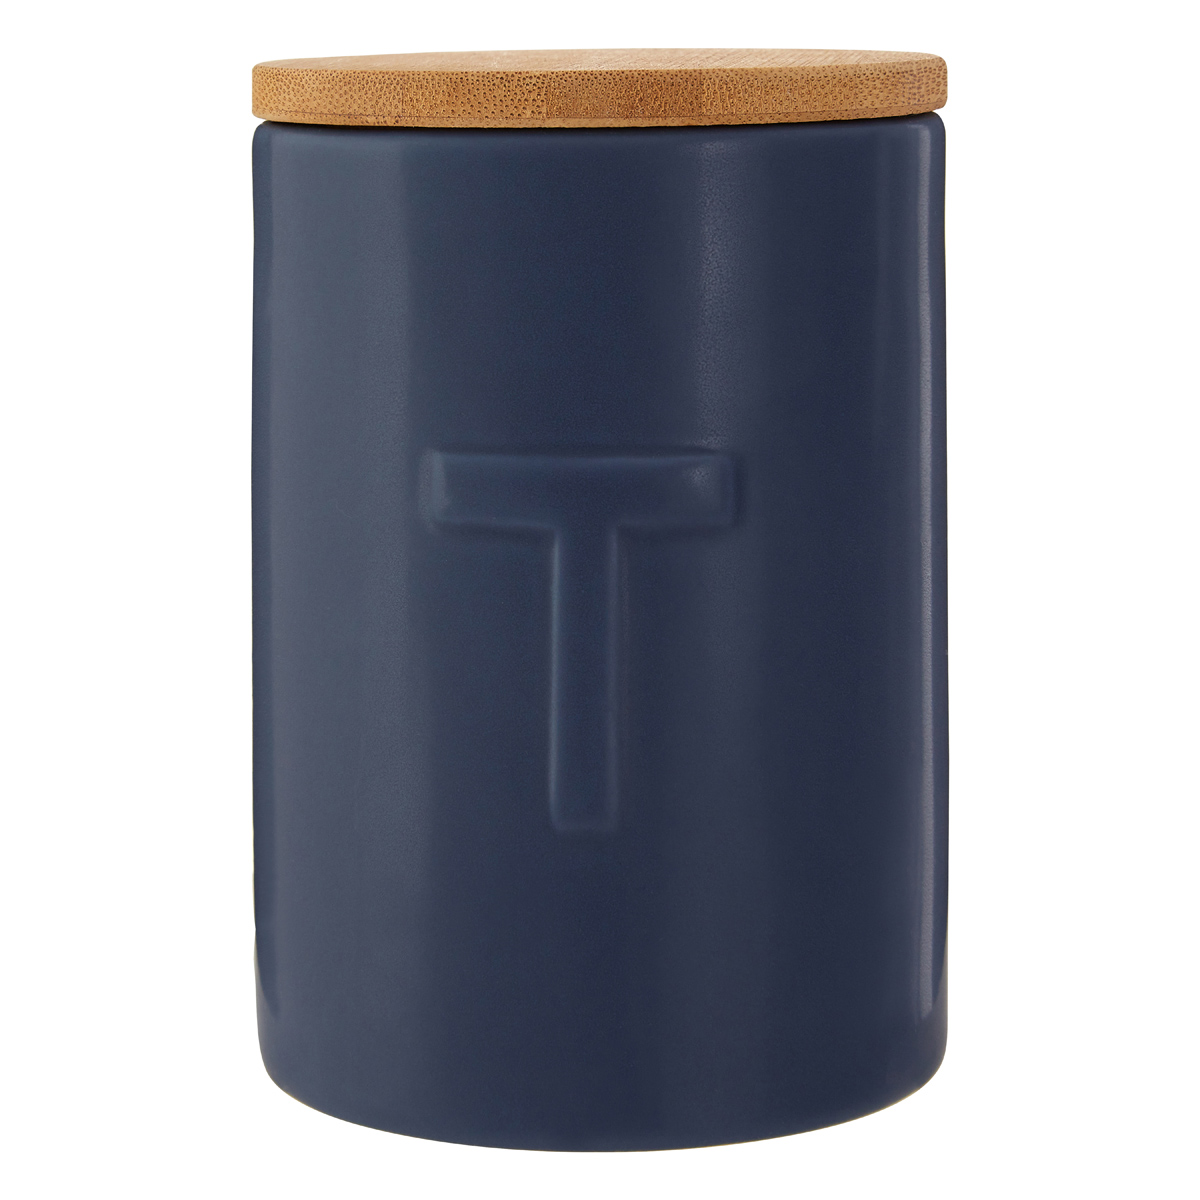 Premier Housewares Fenwick Tee Kanister, dunkelblau Küchen ...